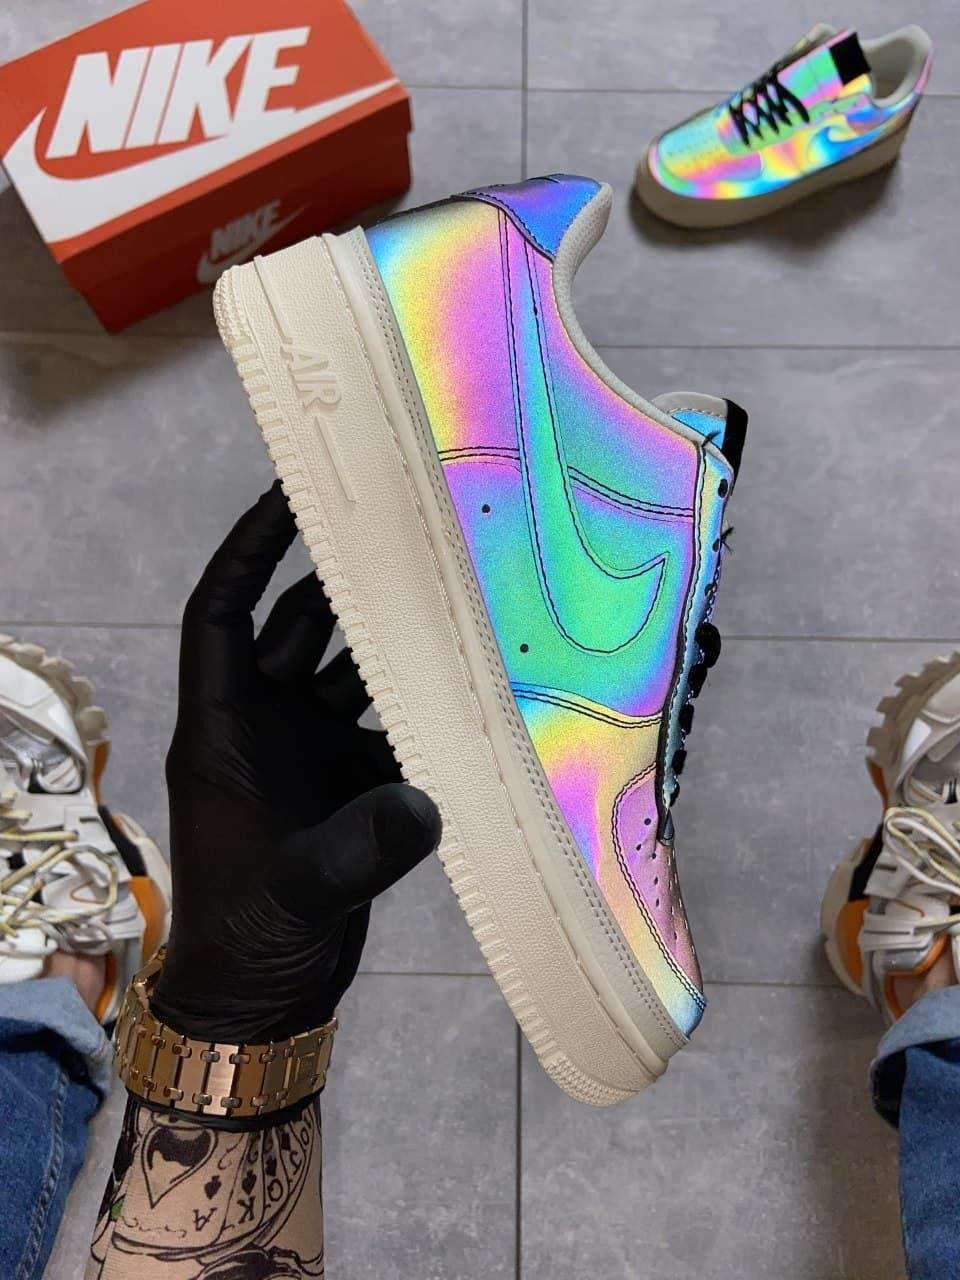 Кроссовки Nike Air Force 1 Low Reflective, черного цвета, Найк Аир Форс